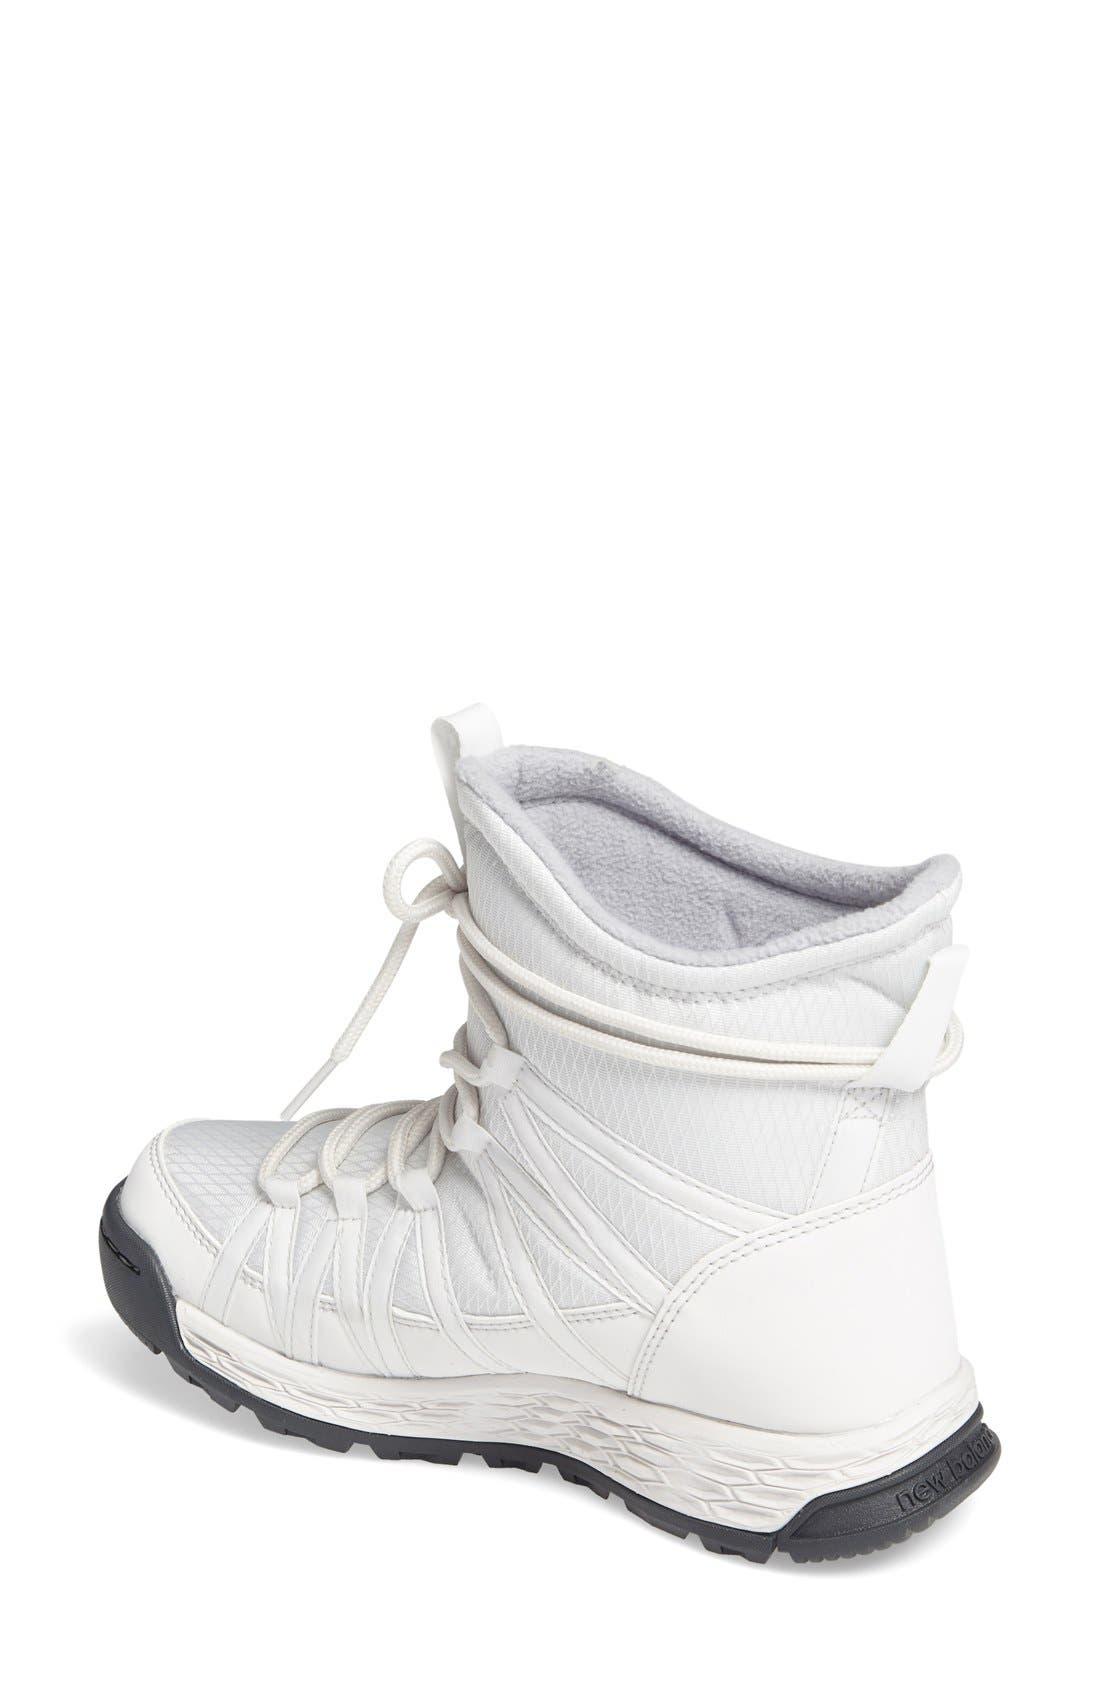 Q416 Weatherproof Snow Boot,                             Alternate thumbnail 6, color,